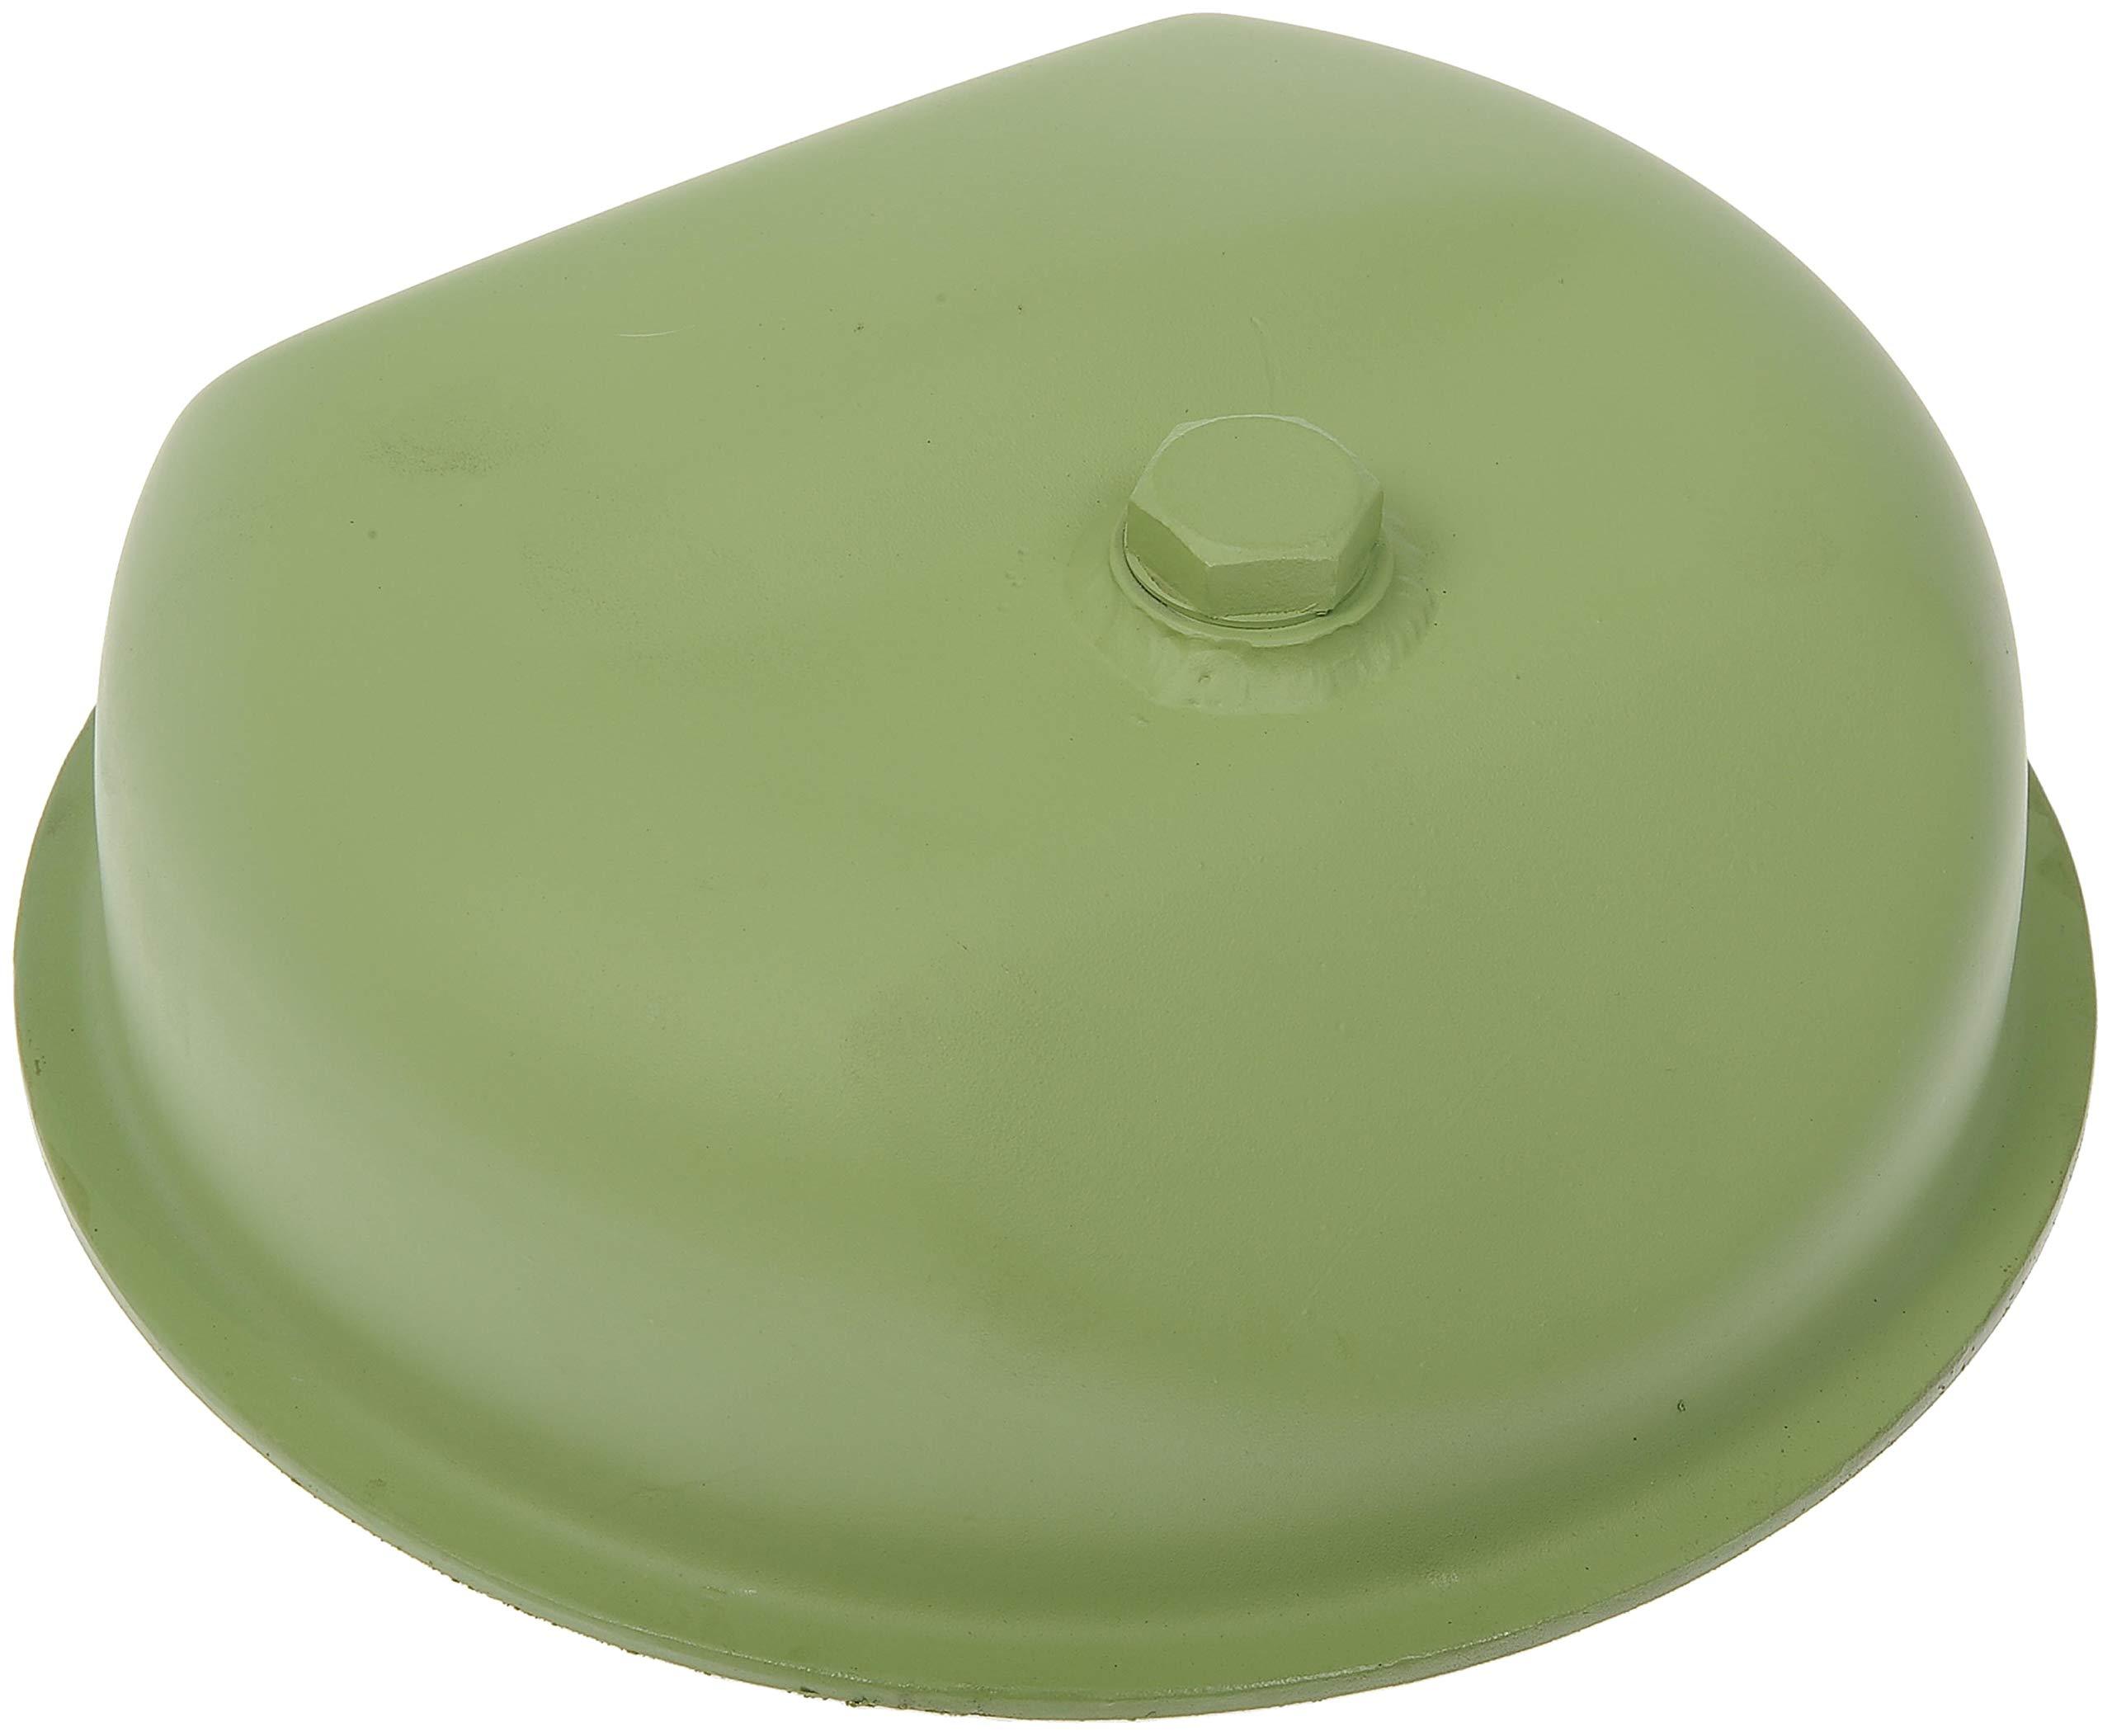 Dorman 926-958 Differential Cover